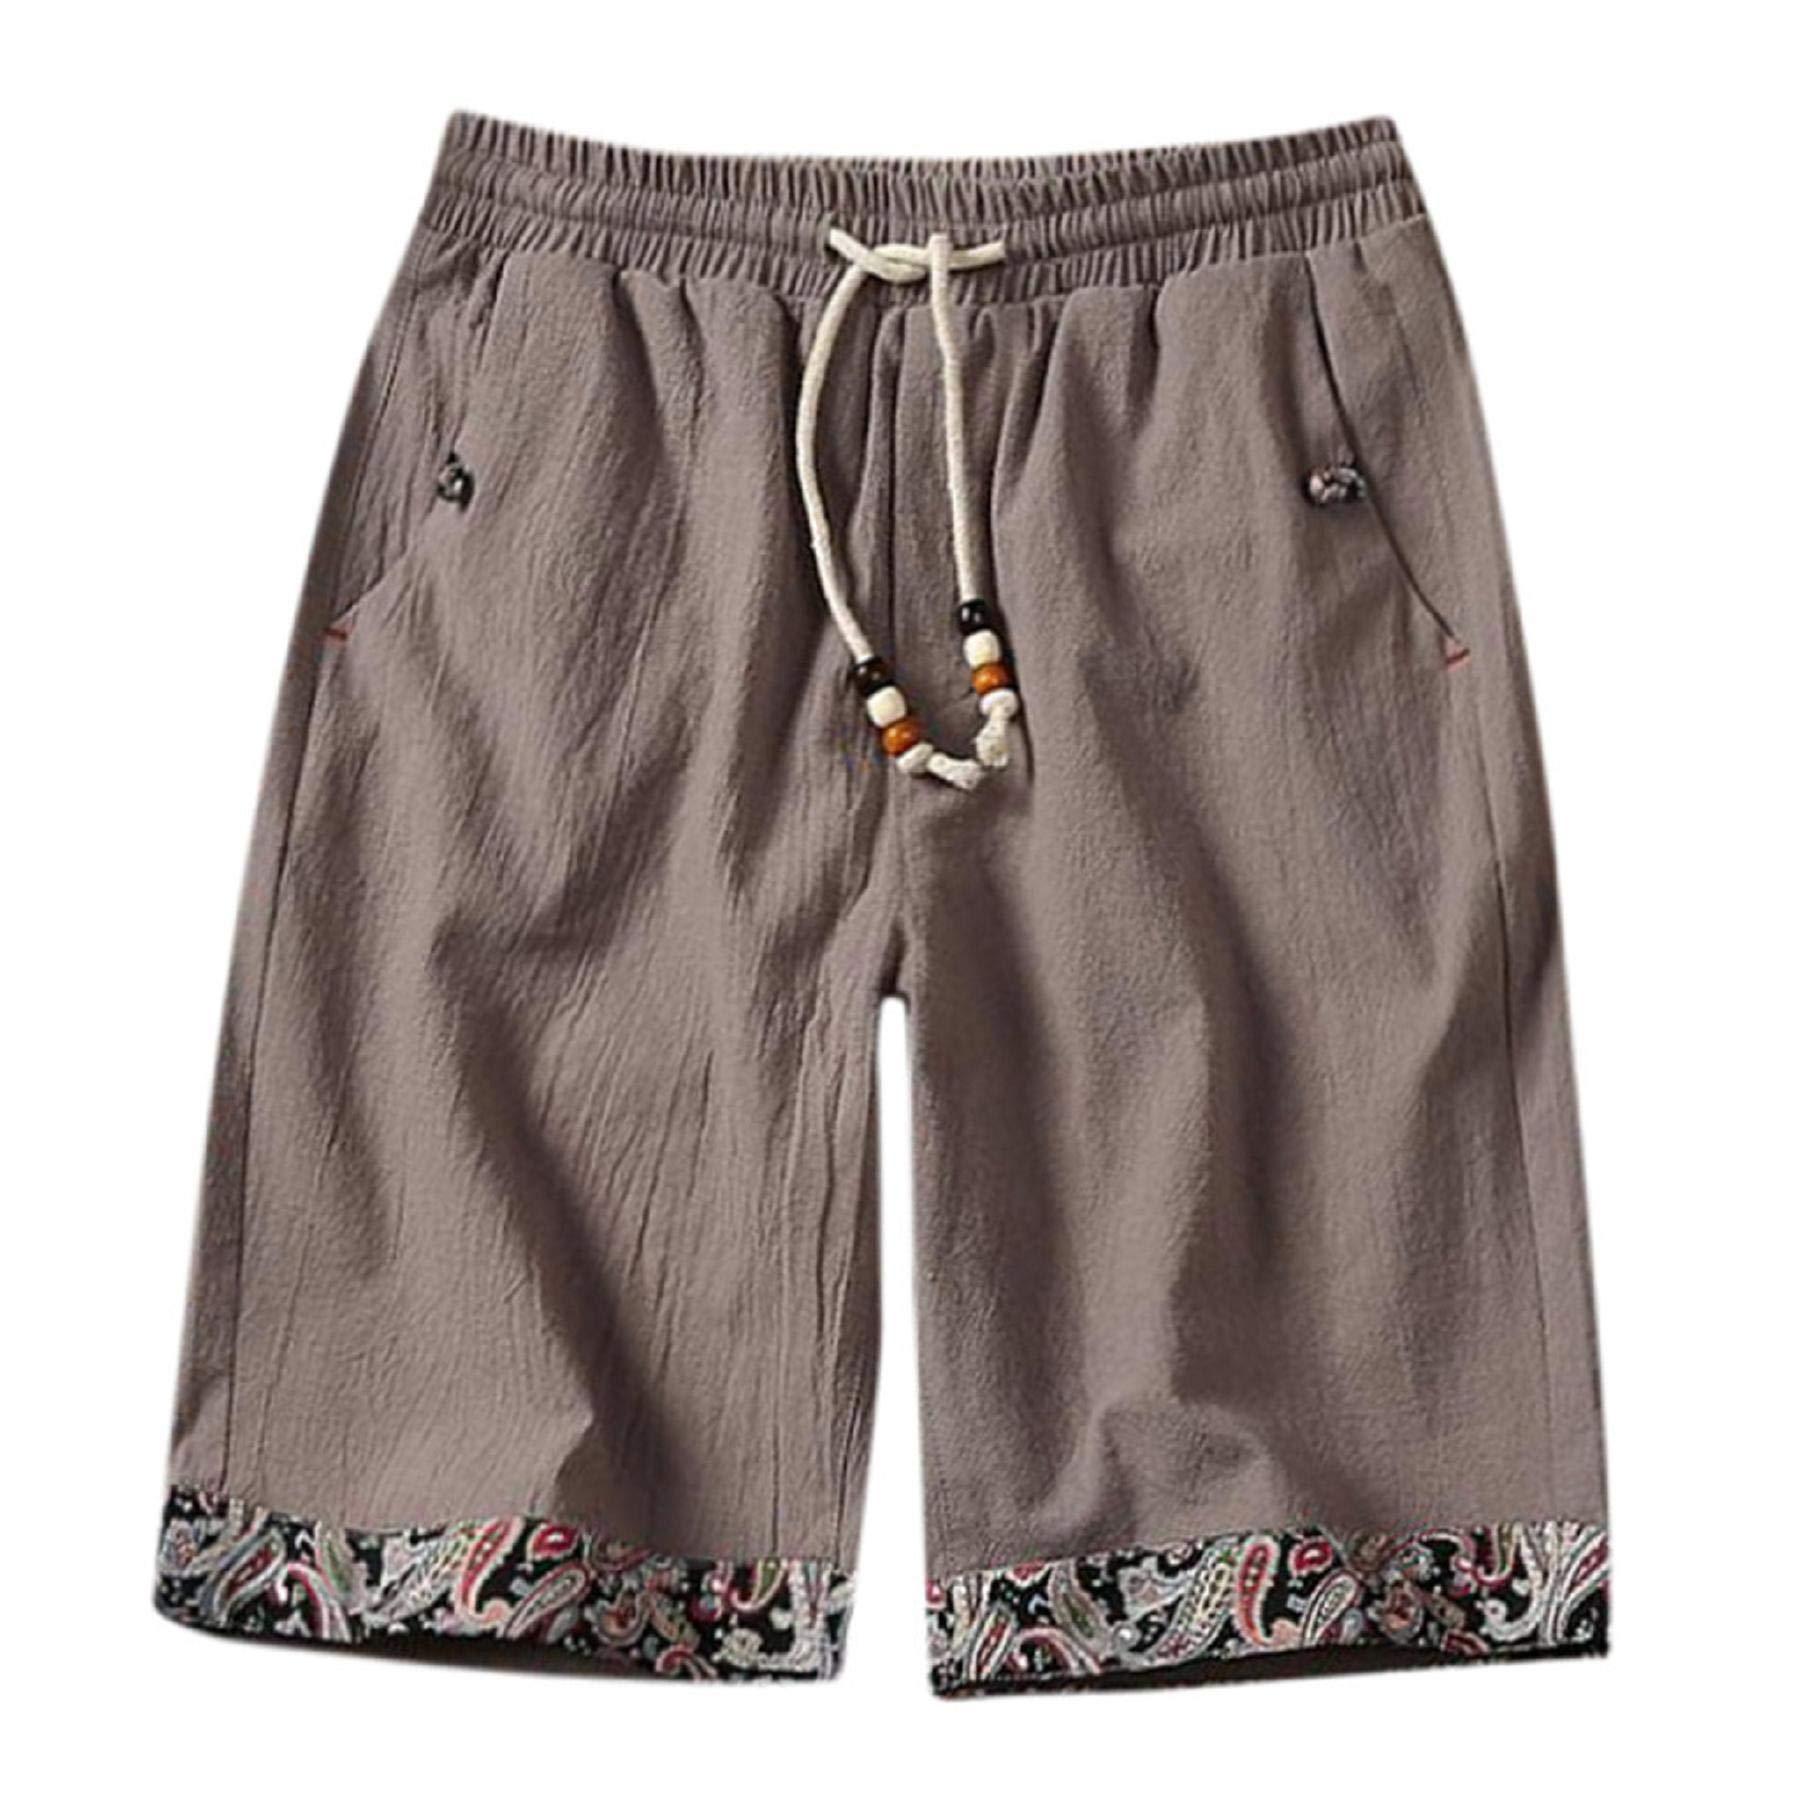 ANKOLA SHOPPING Mens Shorts, Summer Loose Men Drawstring Casual Beach Work Cotton Linen Short Pants Print Hem with Pocket Gray